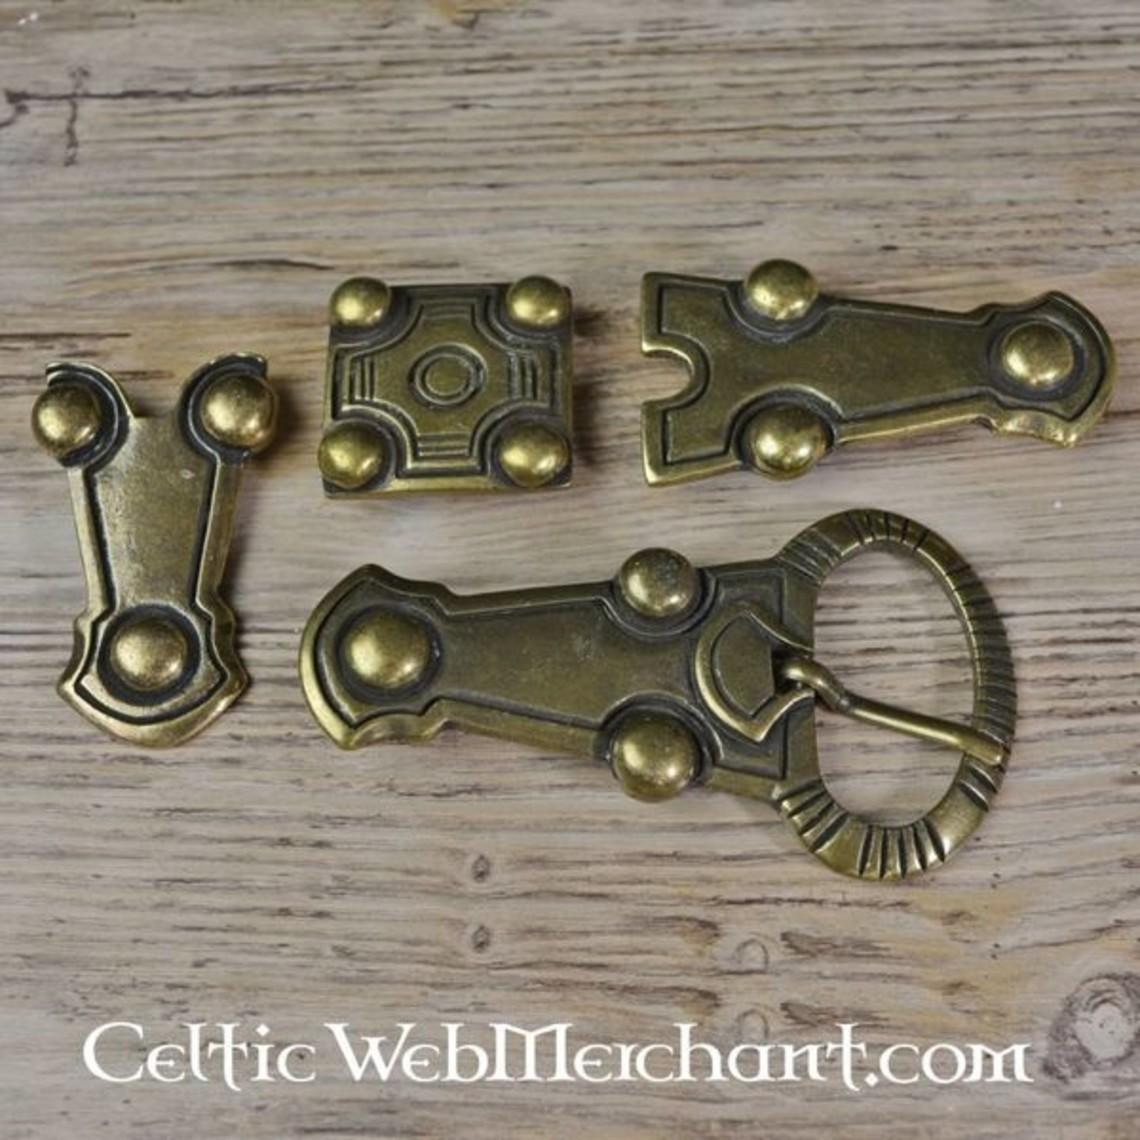 Allemanic belt fitting from Balingen, silvered